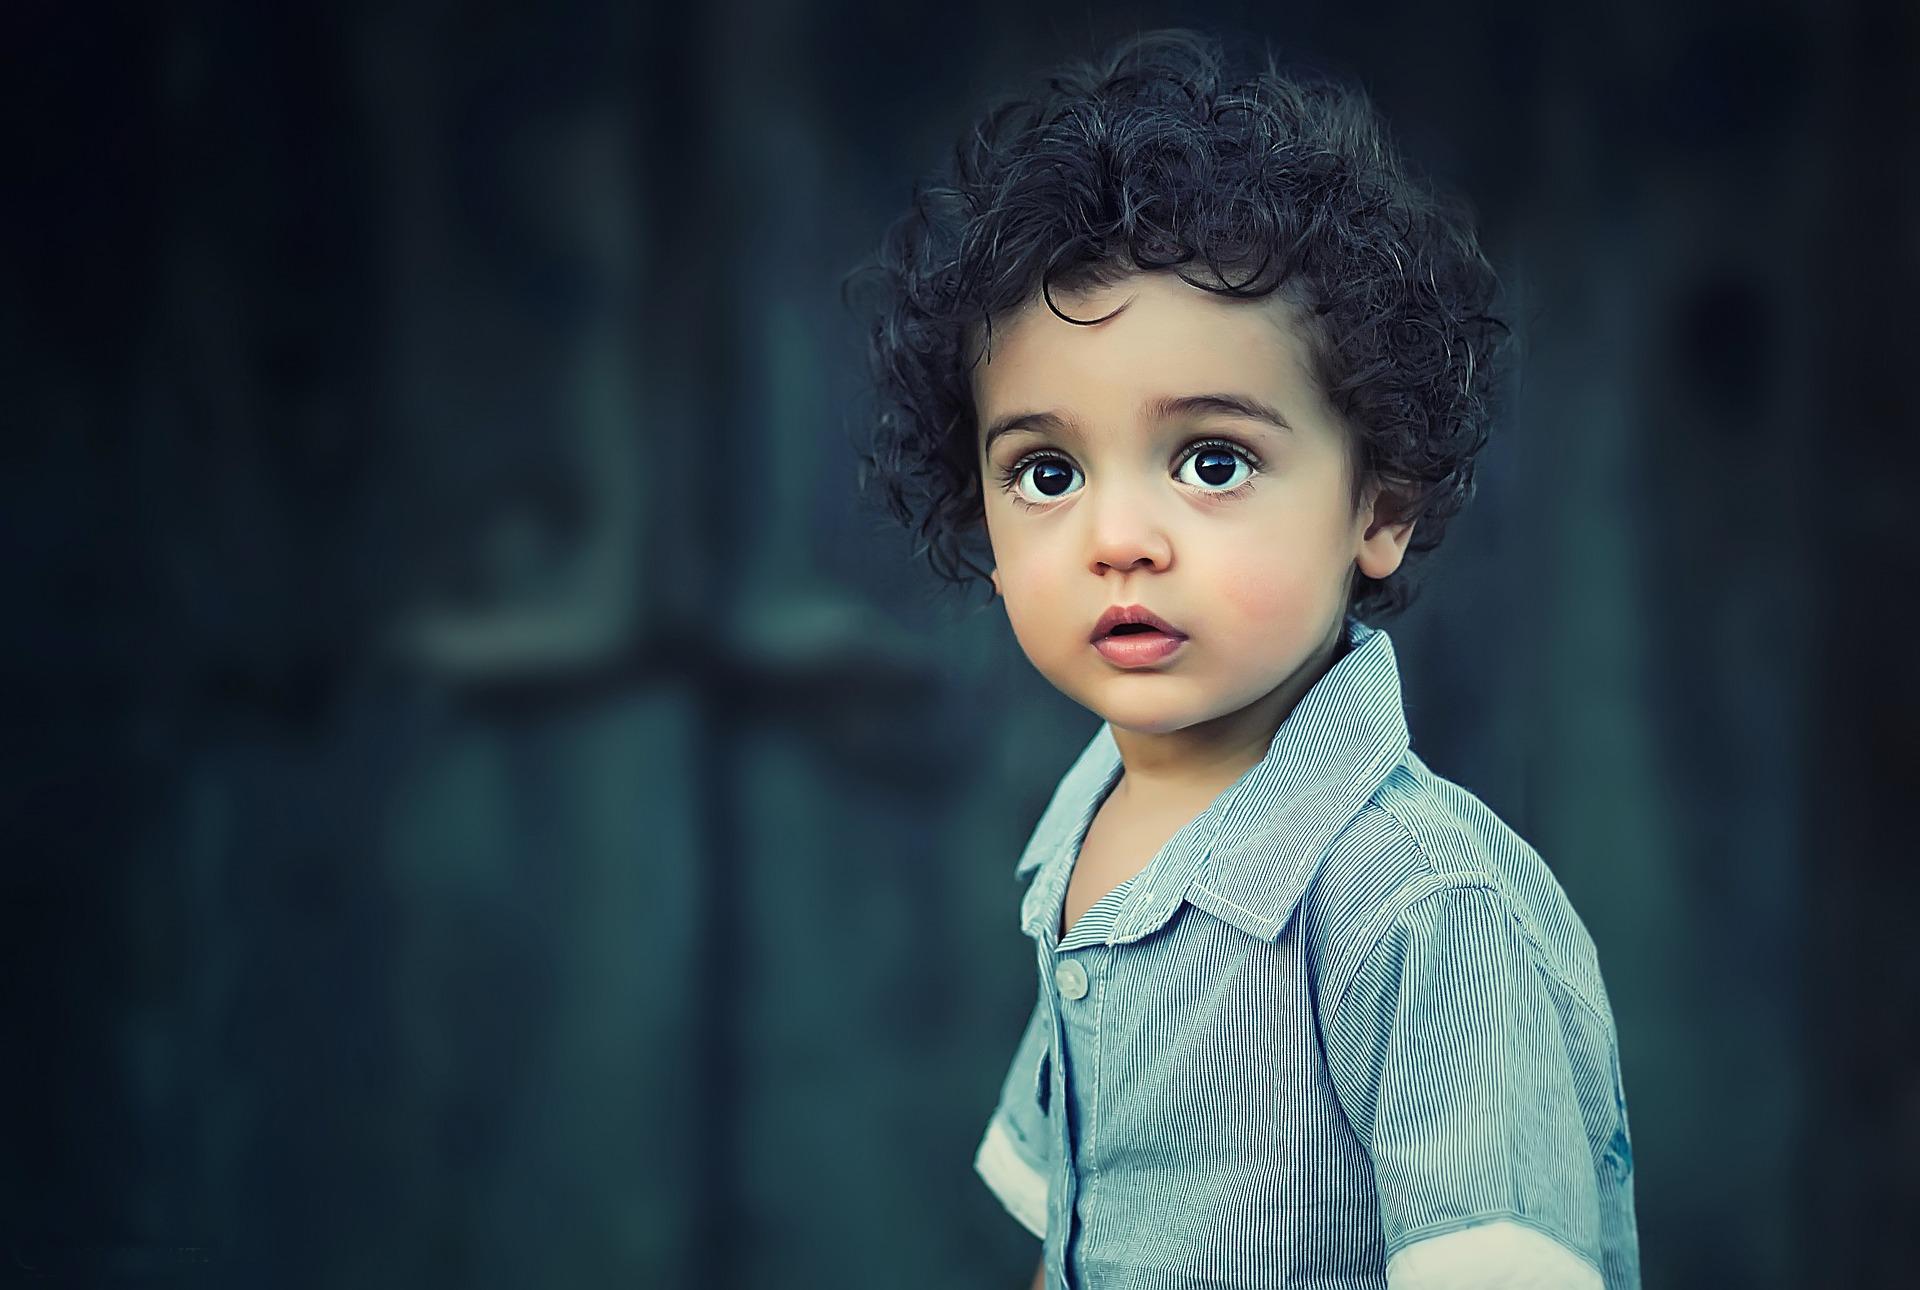 İnsan Çocuğu